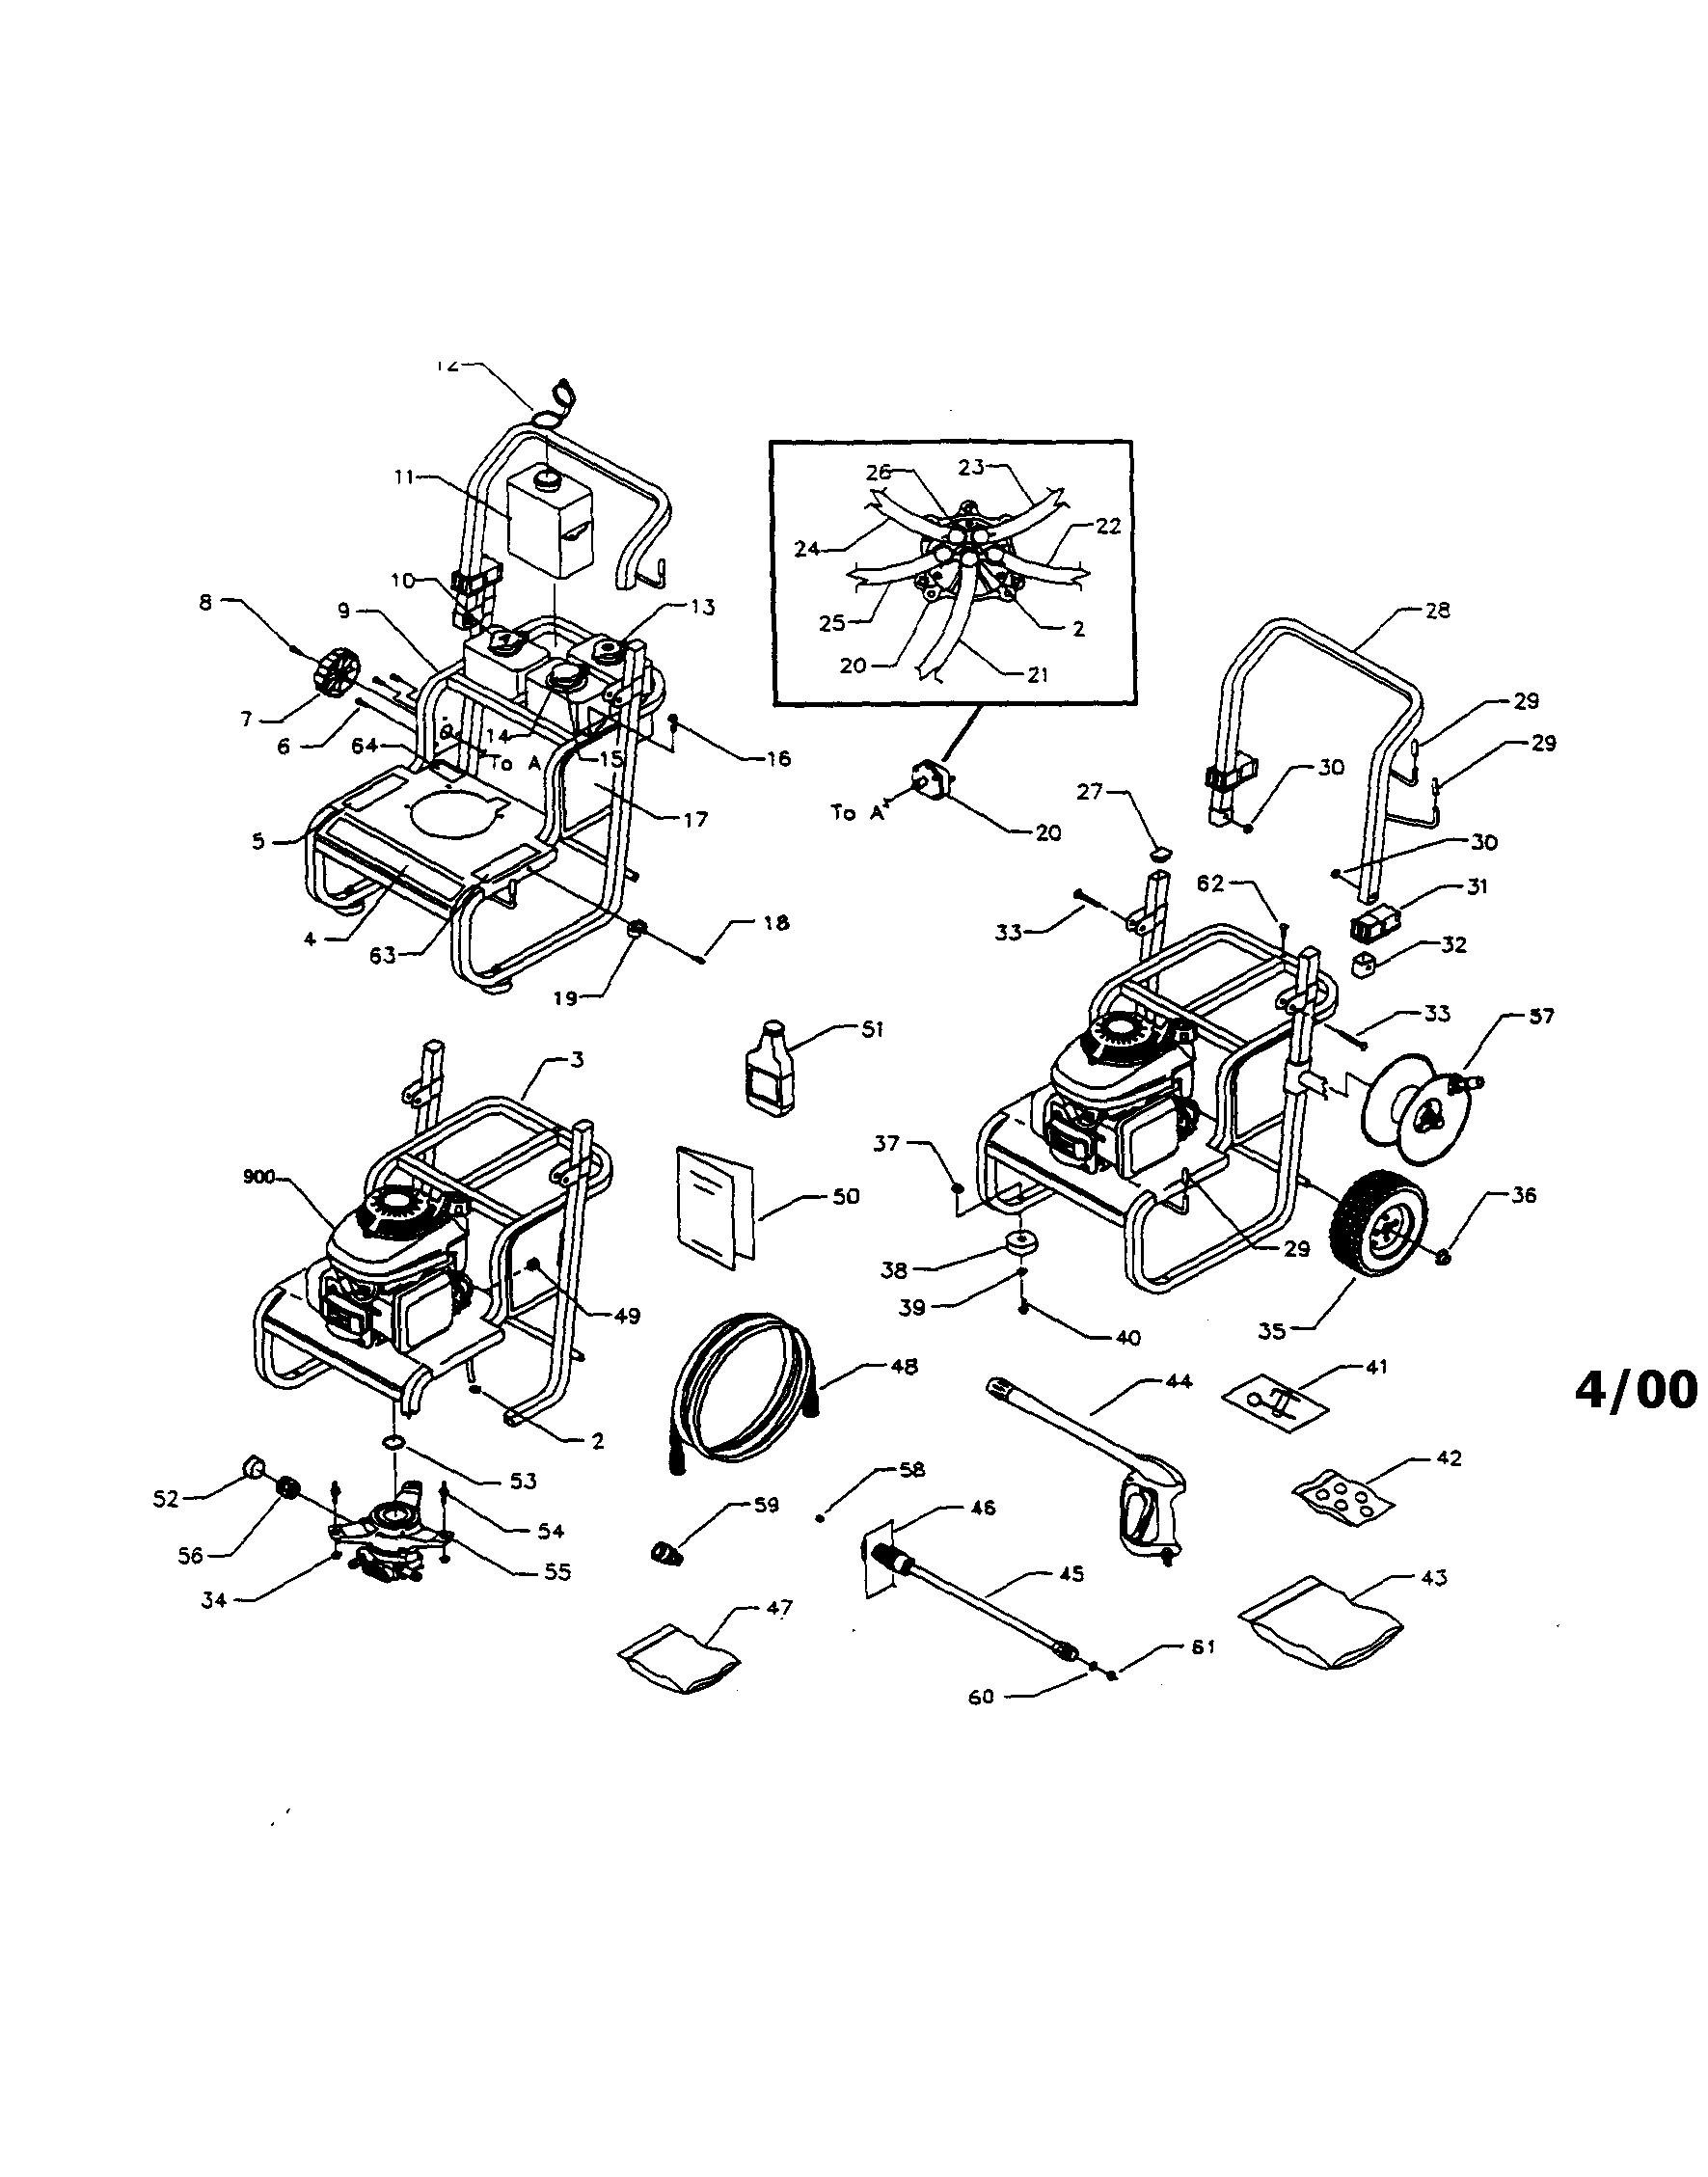 Honda Gcv160 Engine Parts Diagram Honda Gc160 Parts